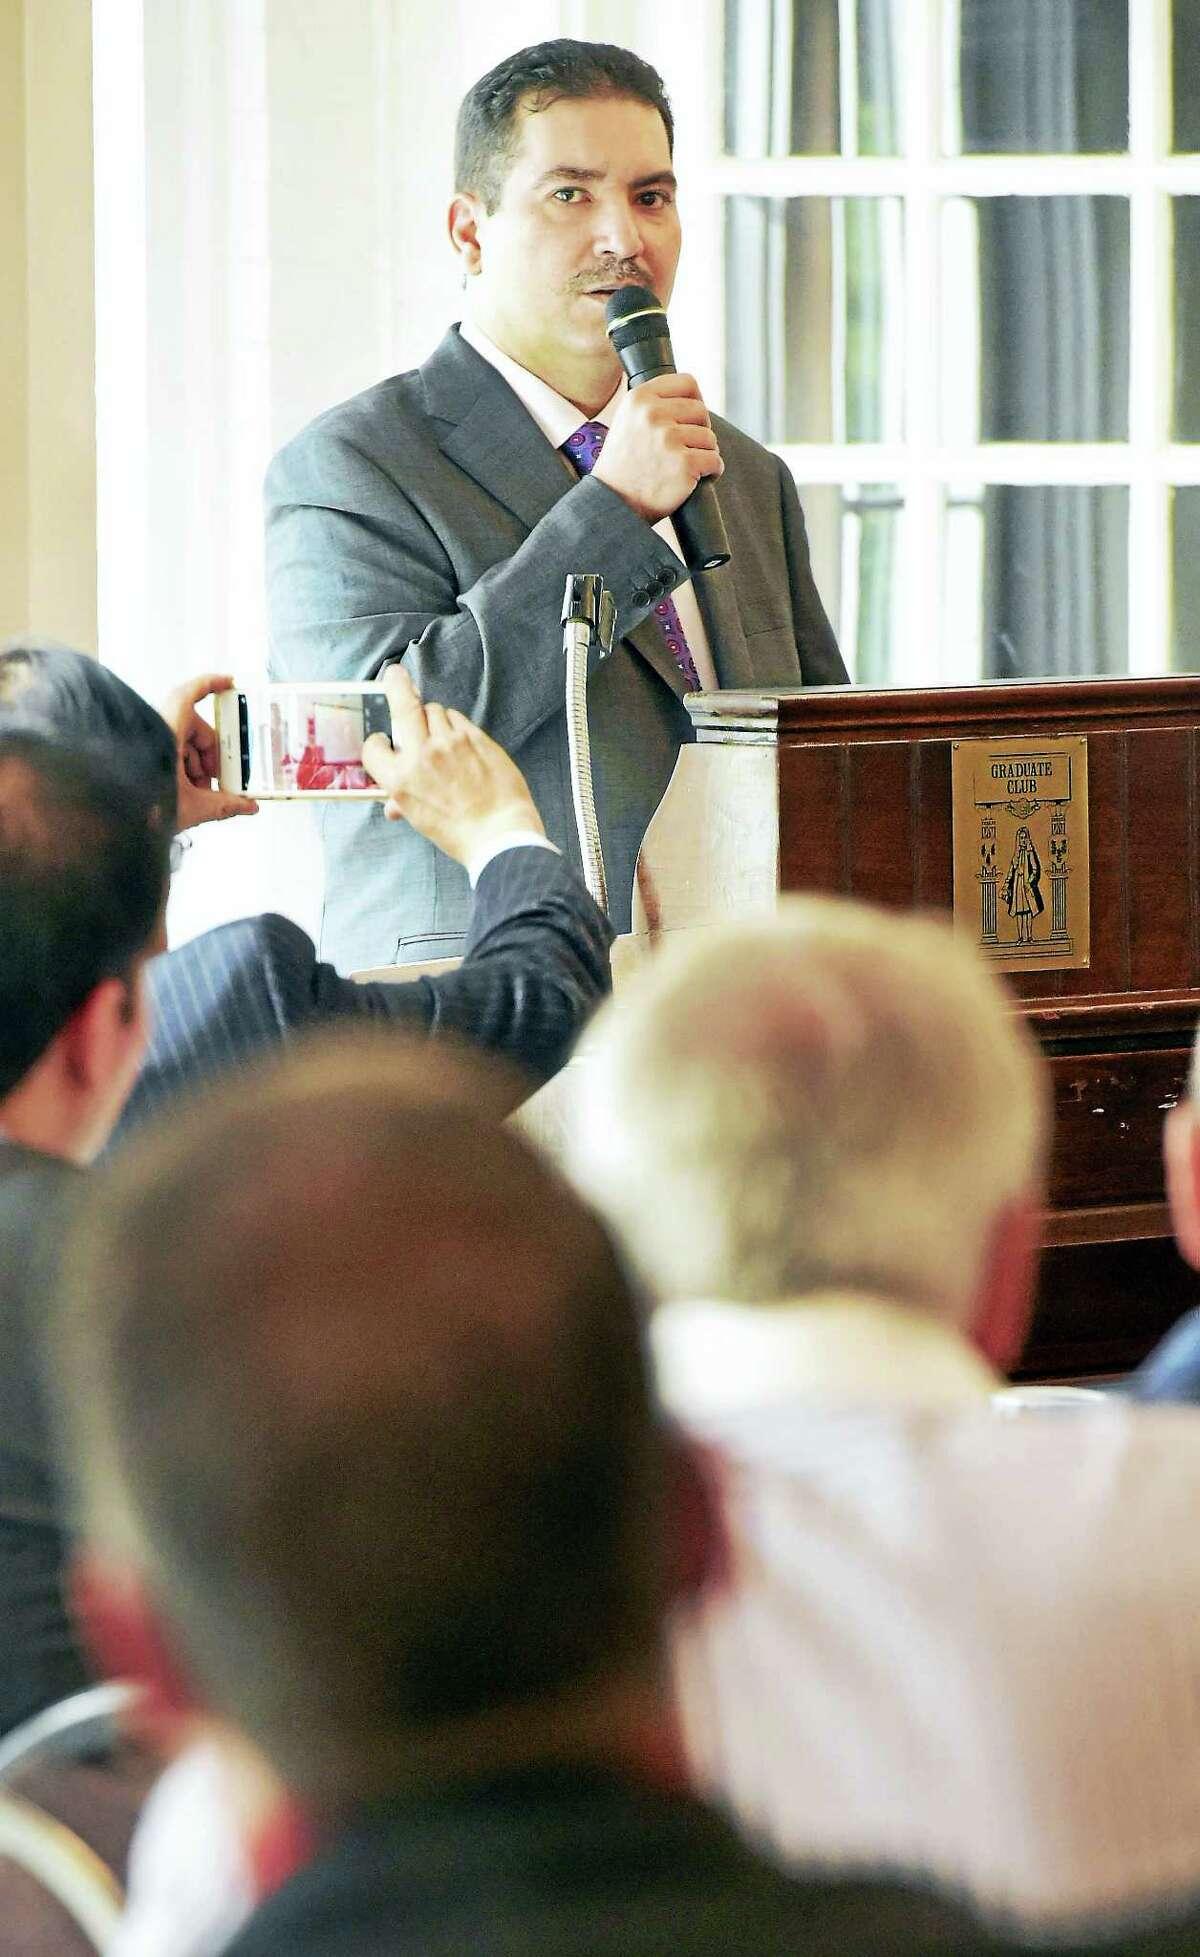 Prince Turki Bin Mohammed Bin Nasser Bin Abdulaziz Al Saud speaks during an International Trade Forum Wednesday at the Graduate Club in New Haven.